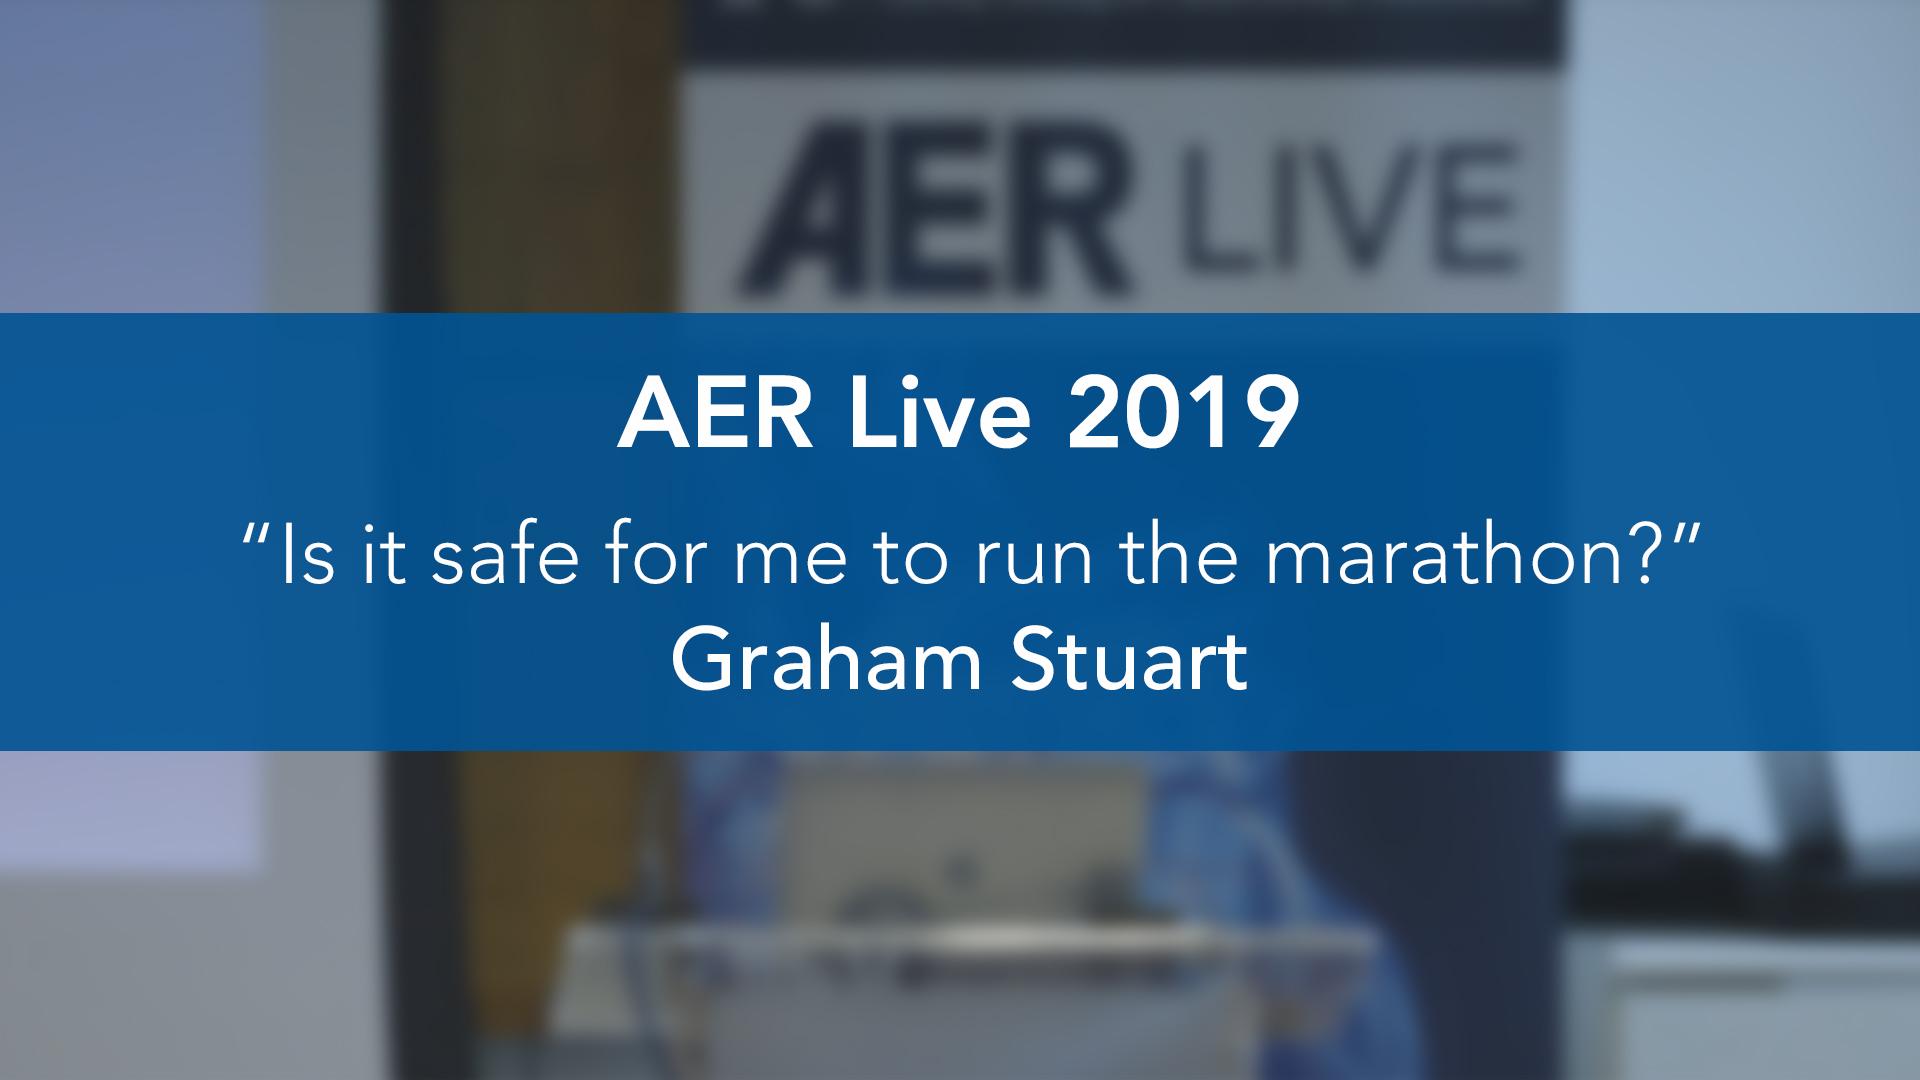 AER: Live 2019: Is it safe for me to run the marathon? — Graham Stuart